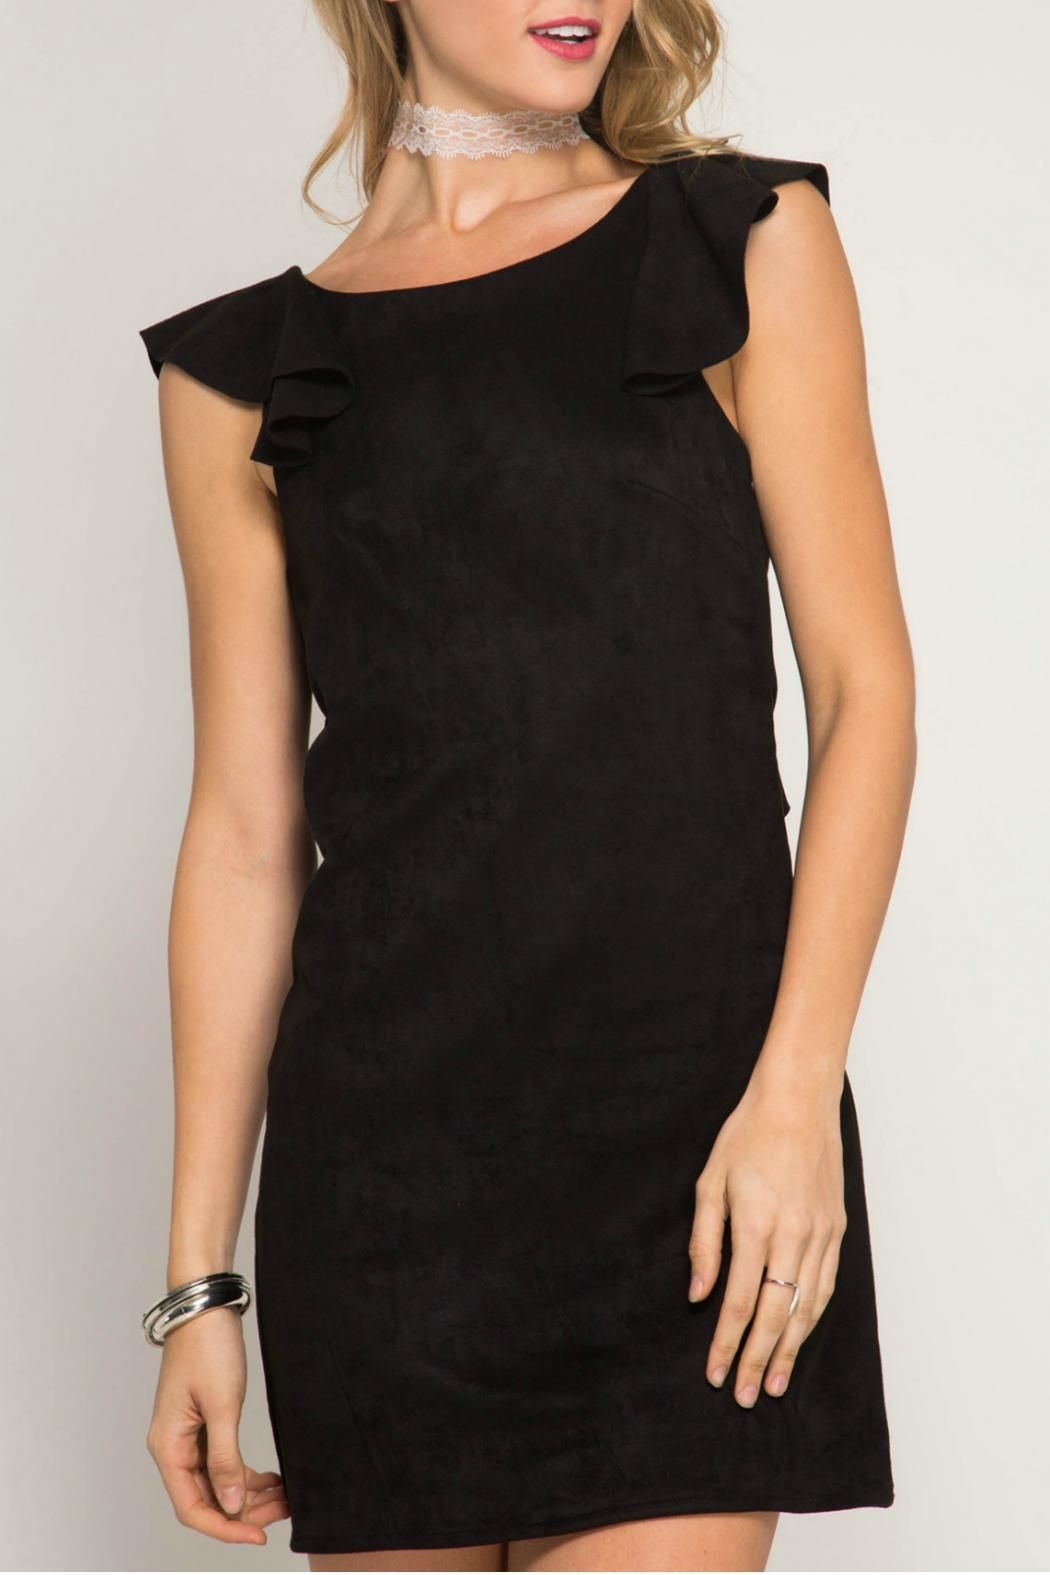 Open Back Dress Open Back Dresses Dresses Little Black Dress [ 1575 x 1050 Pixel ]